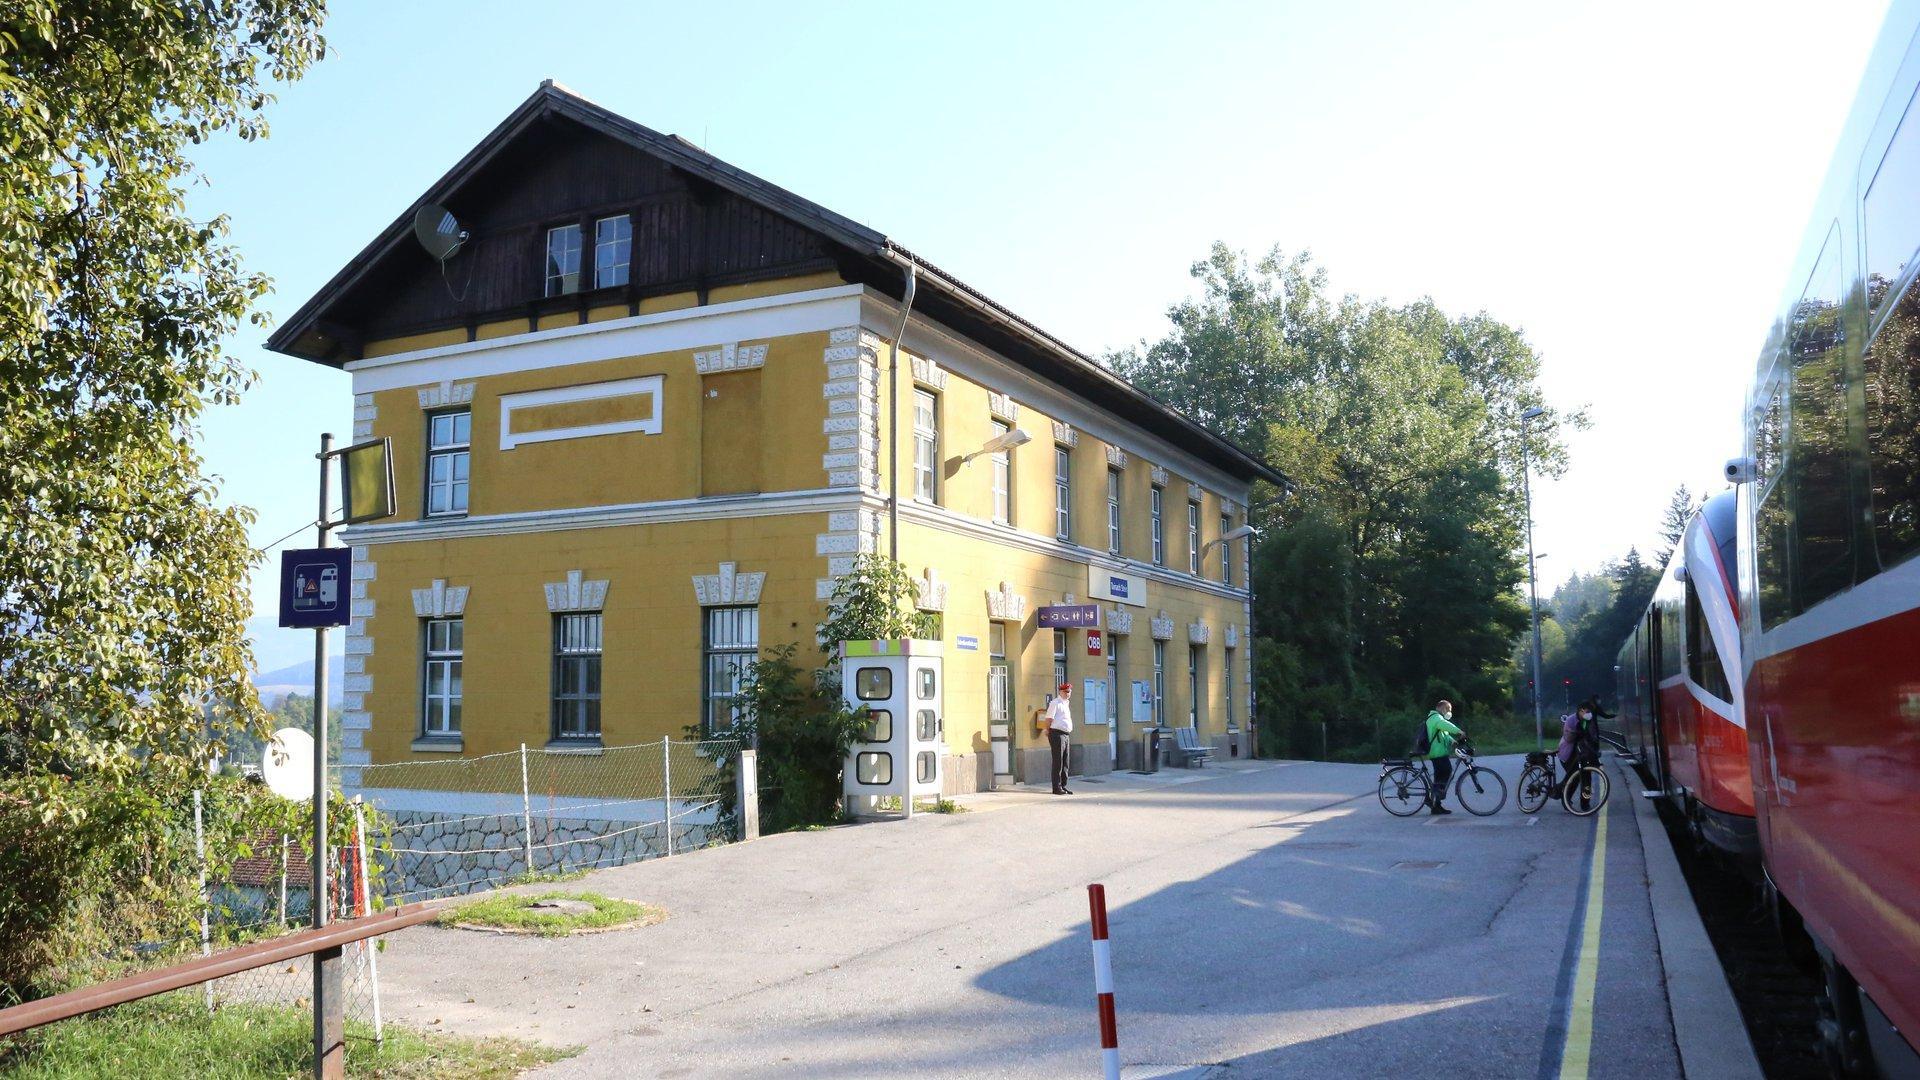 Tainach-Stein Bahnhof